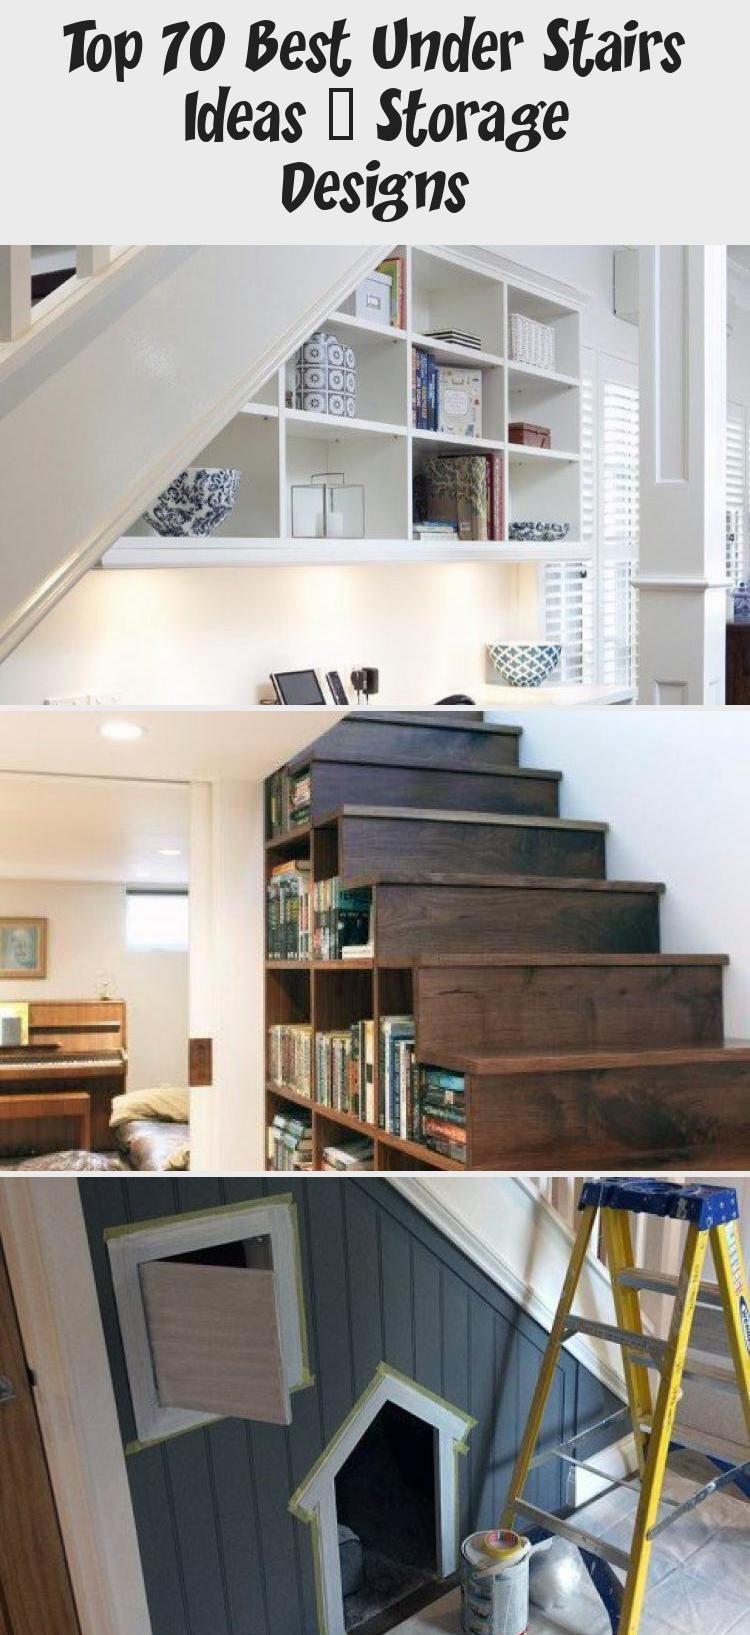 pull out cabinet for kitchen storage ideas for under stairs interior kitchenstoragespices on kitchen under stairs id=11990